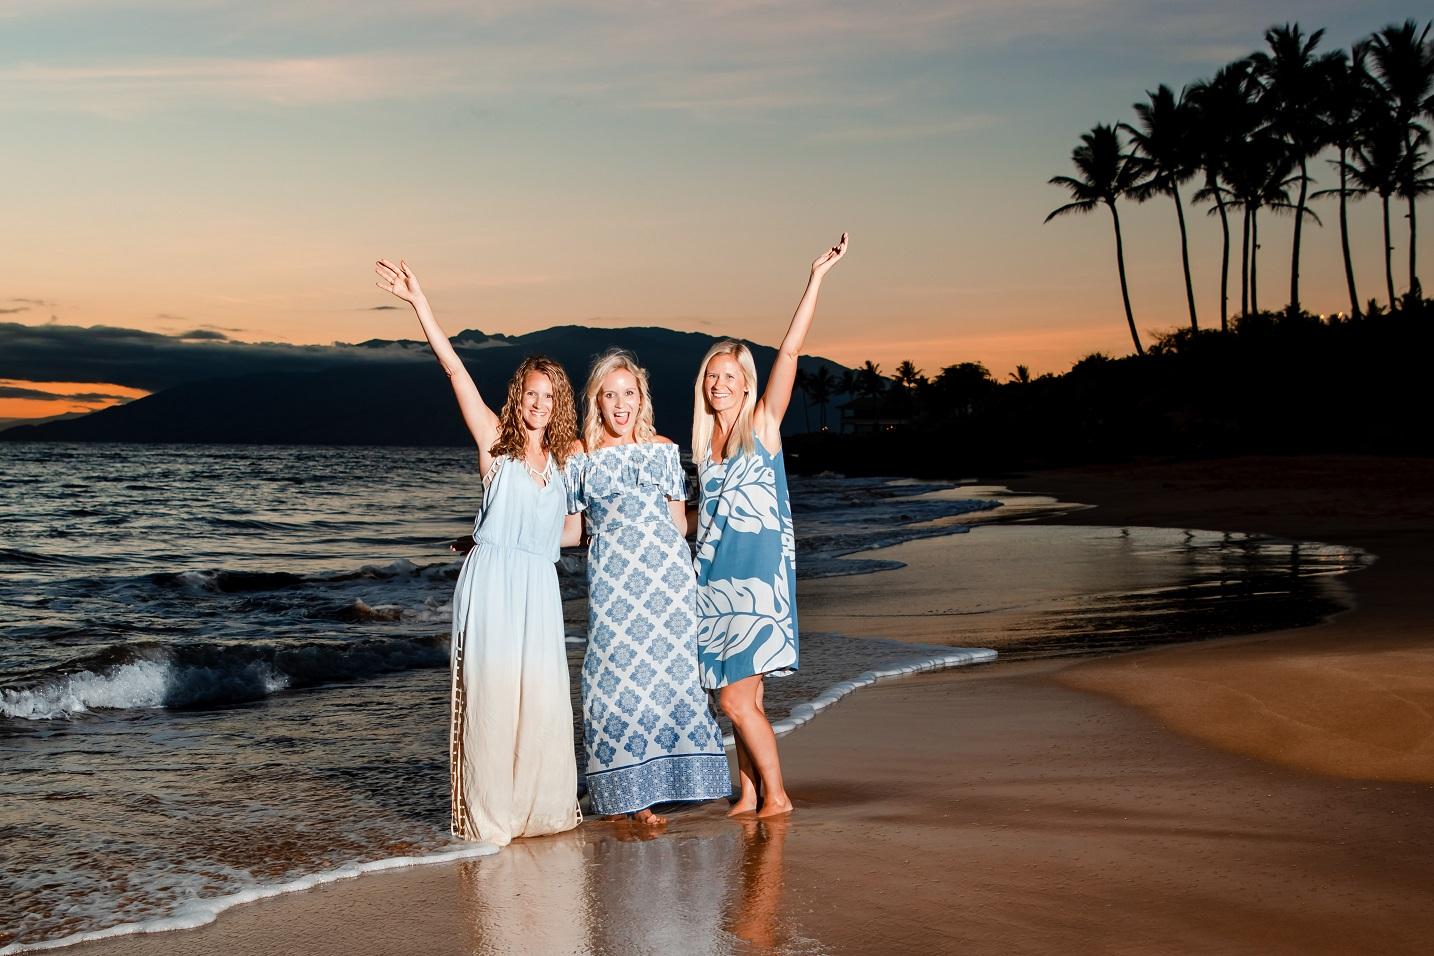 Maui2018-40967-2.jpg